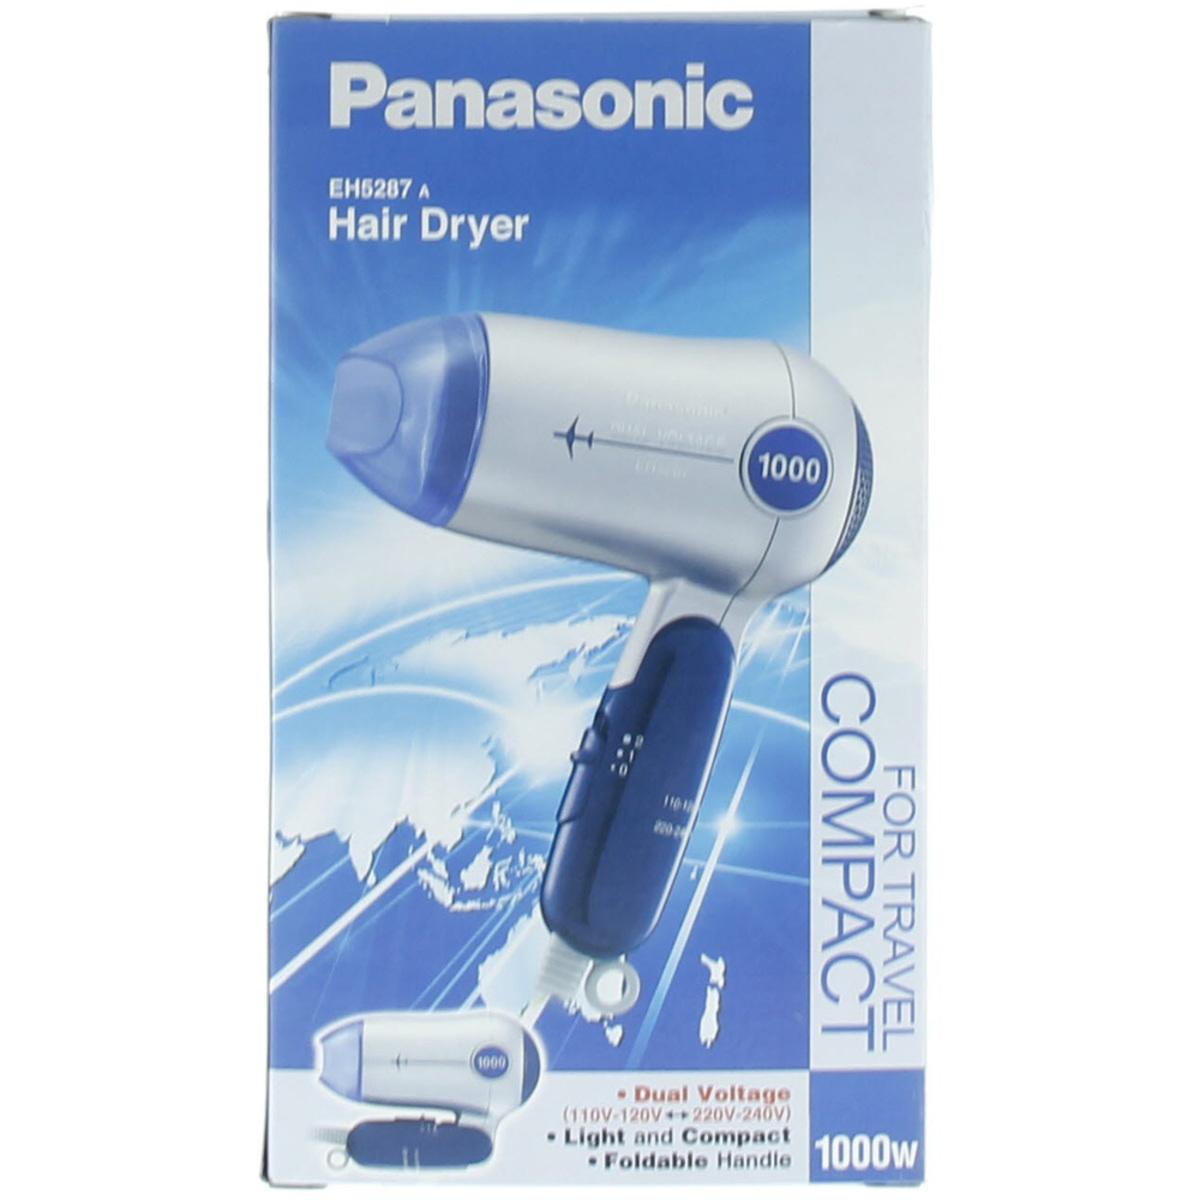 Panasonic Hair Dryer EH-5287